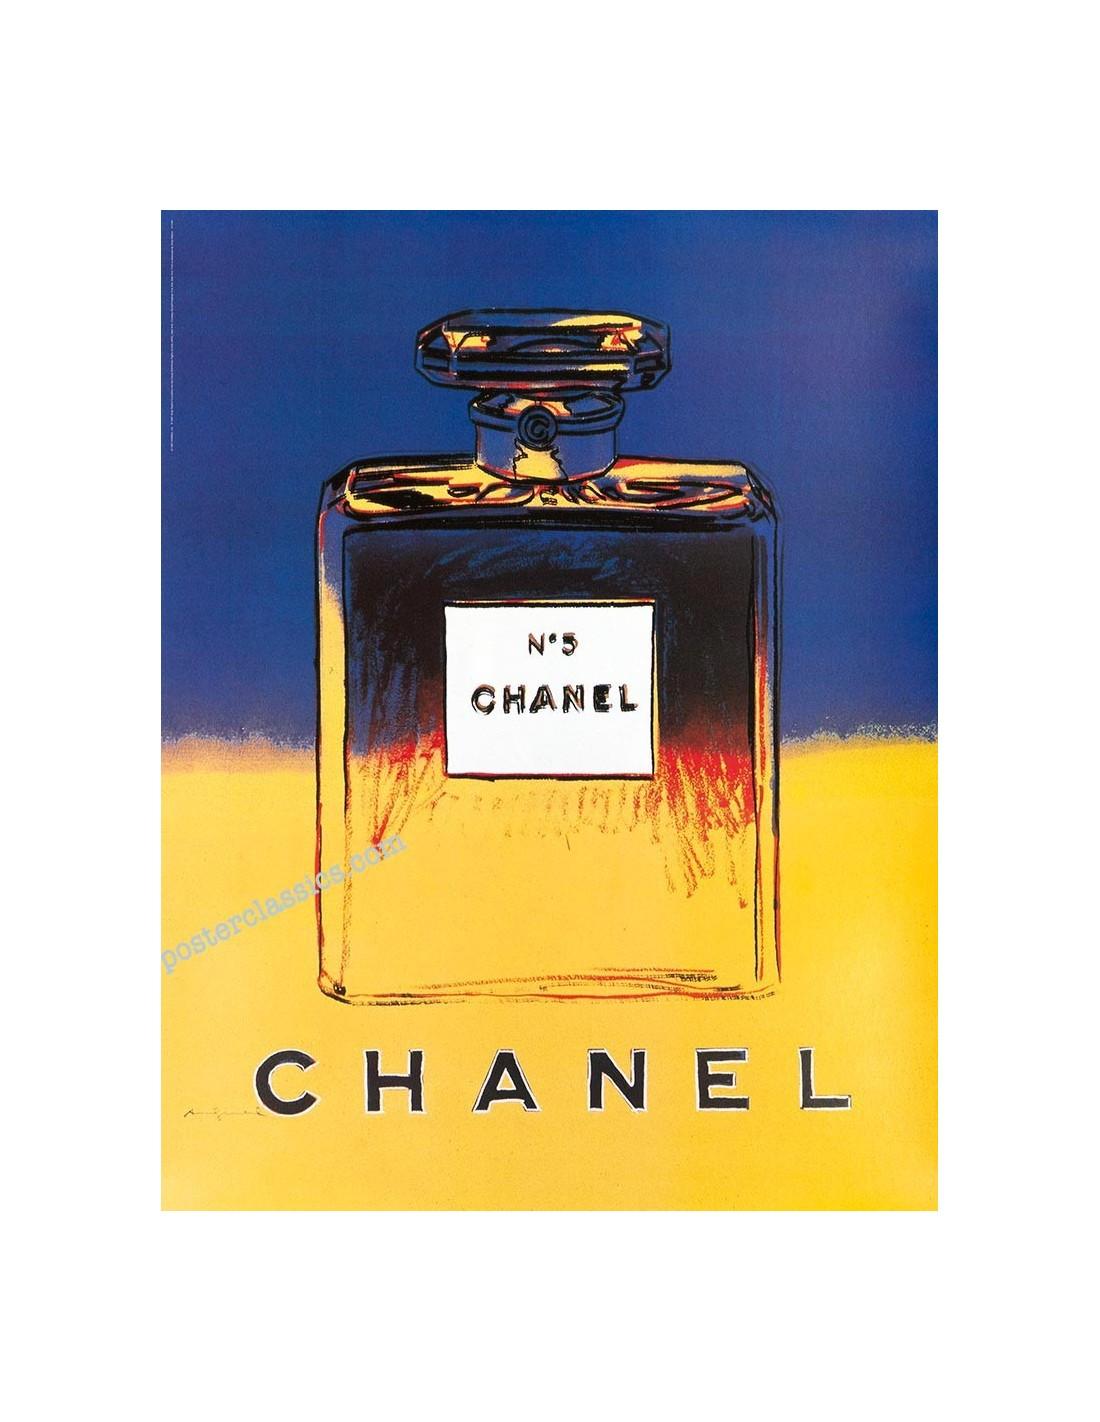 andy warhol chanel n5 perfume complete